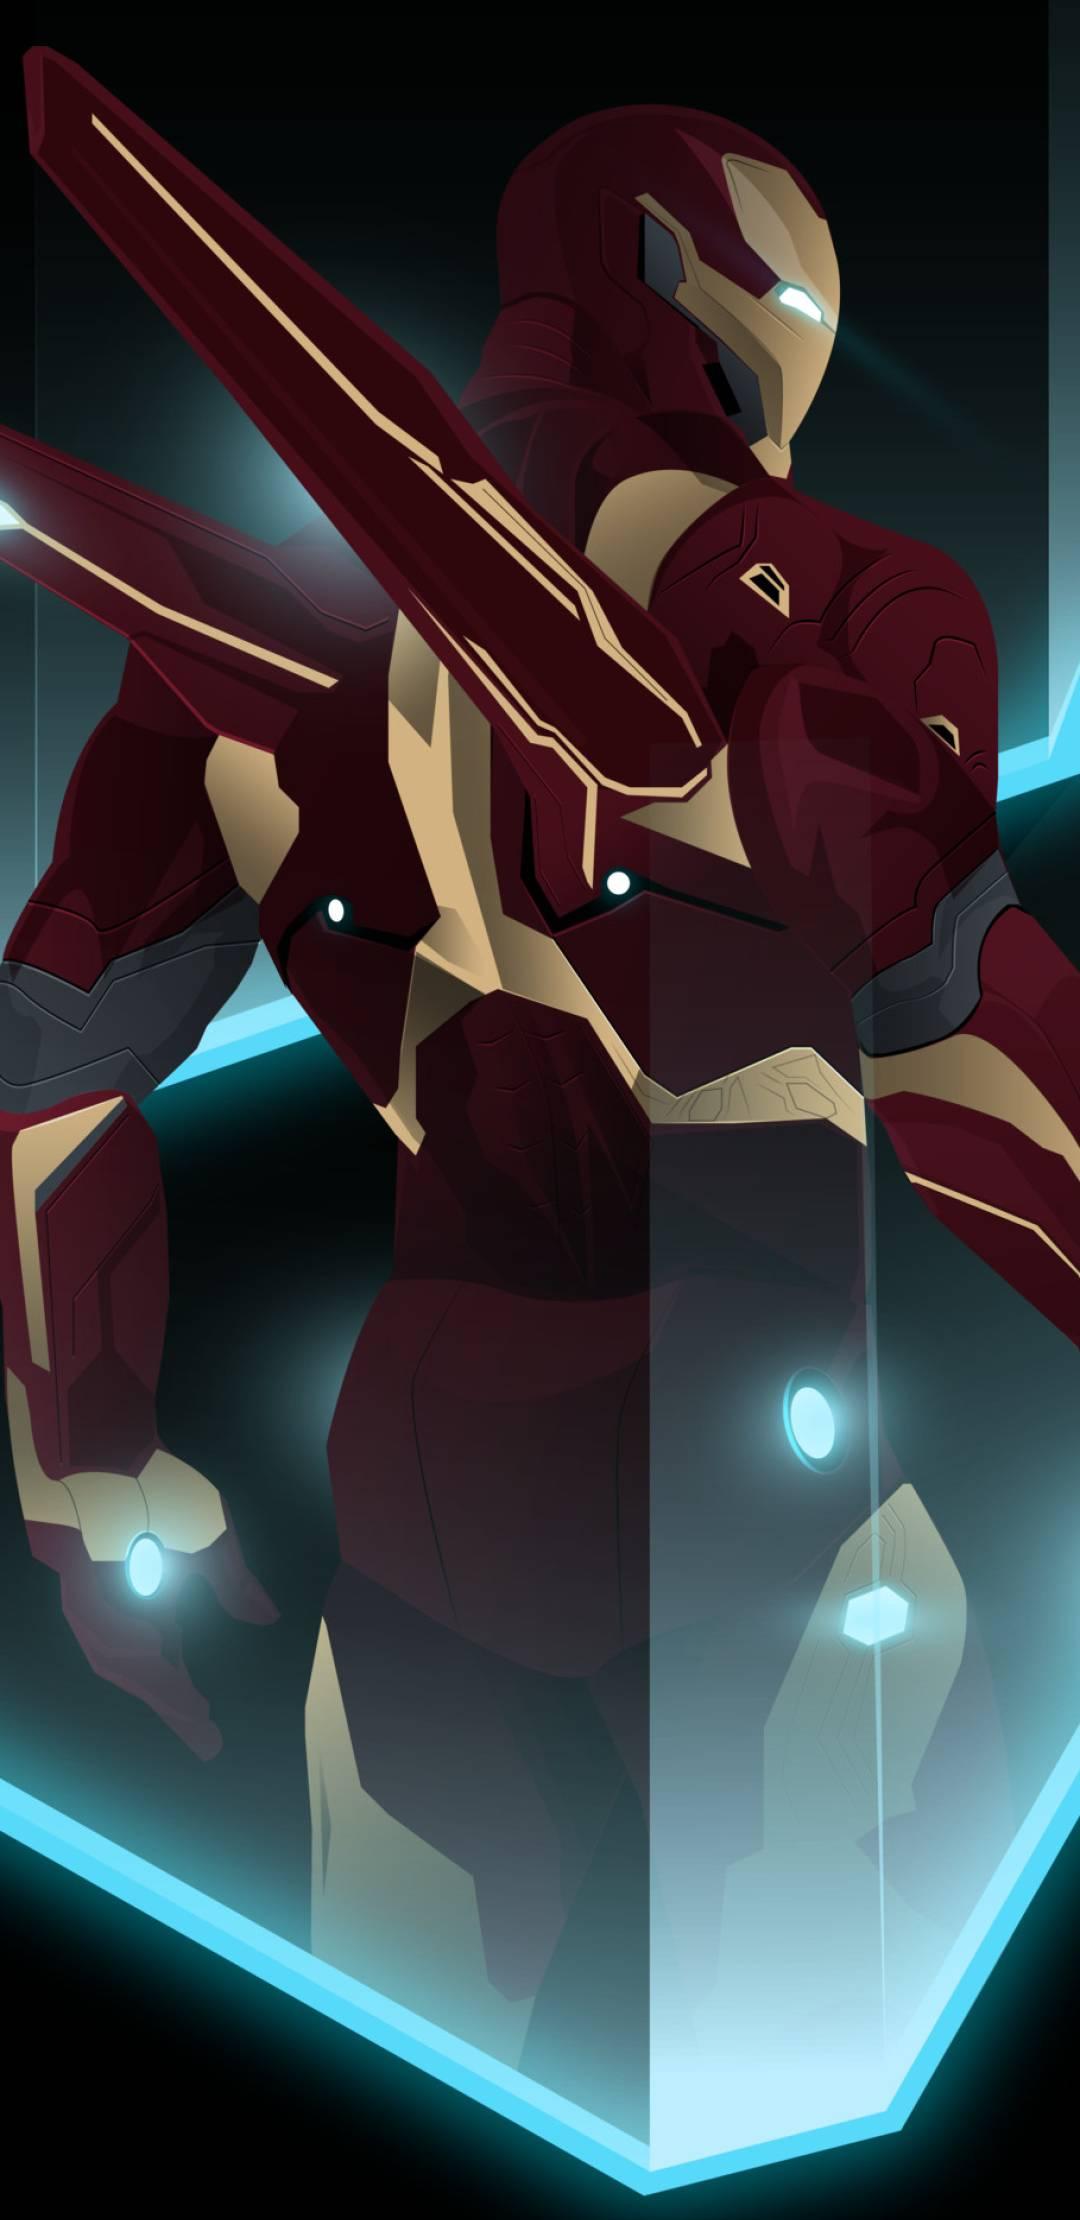 Iron Man MK 50 Animated iPhone Wallpaper